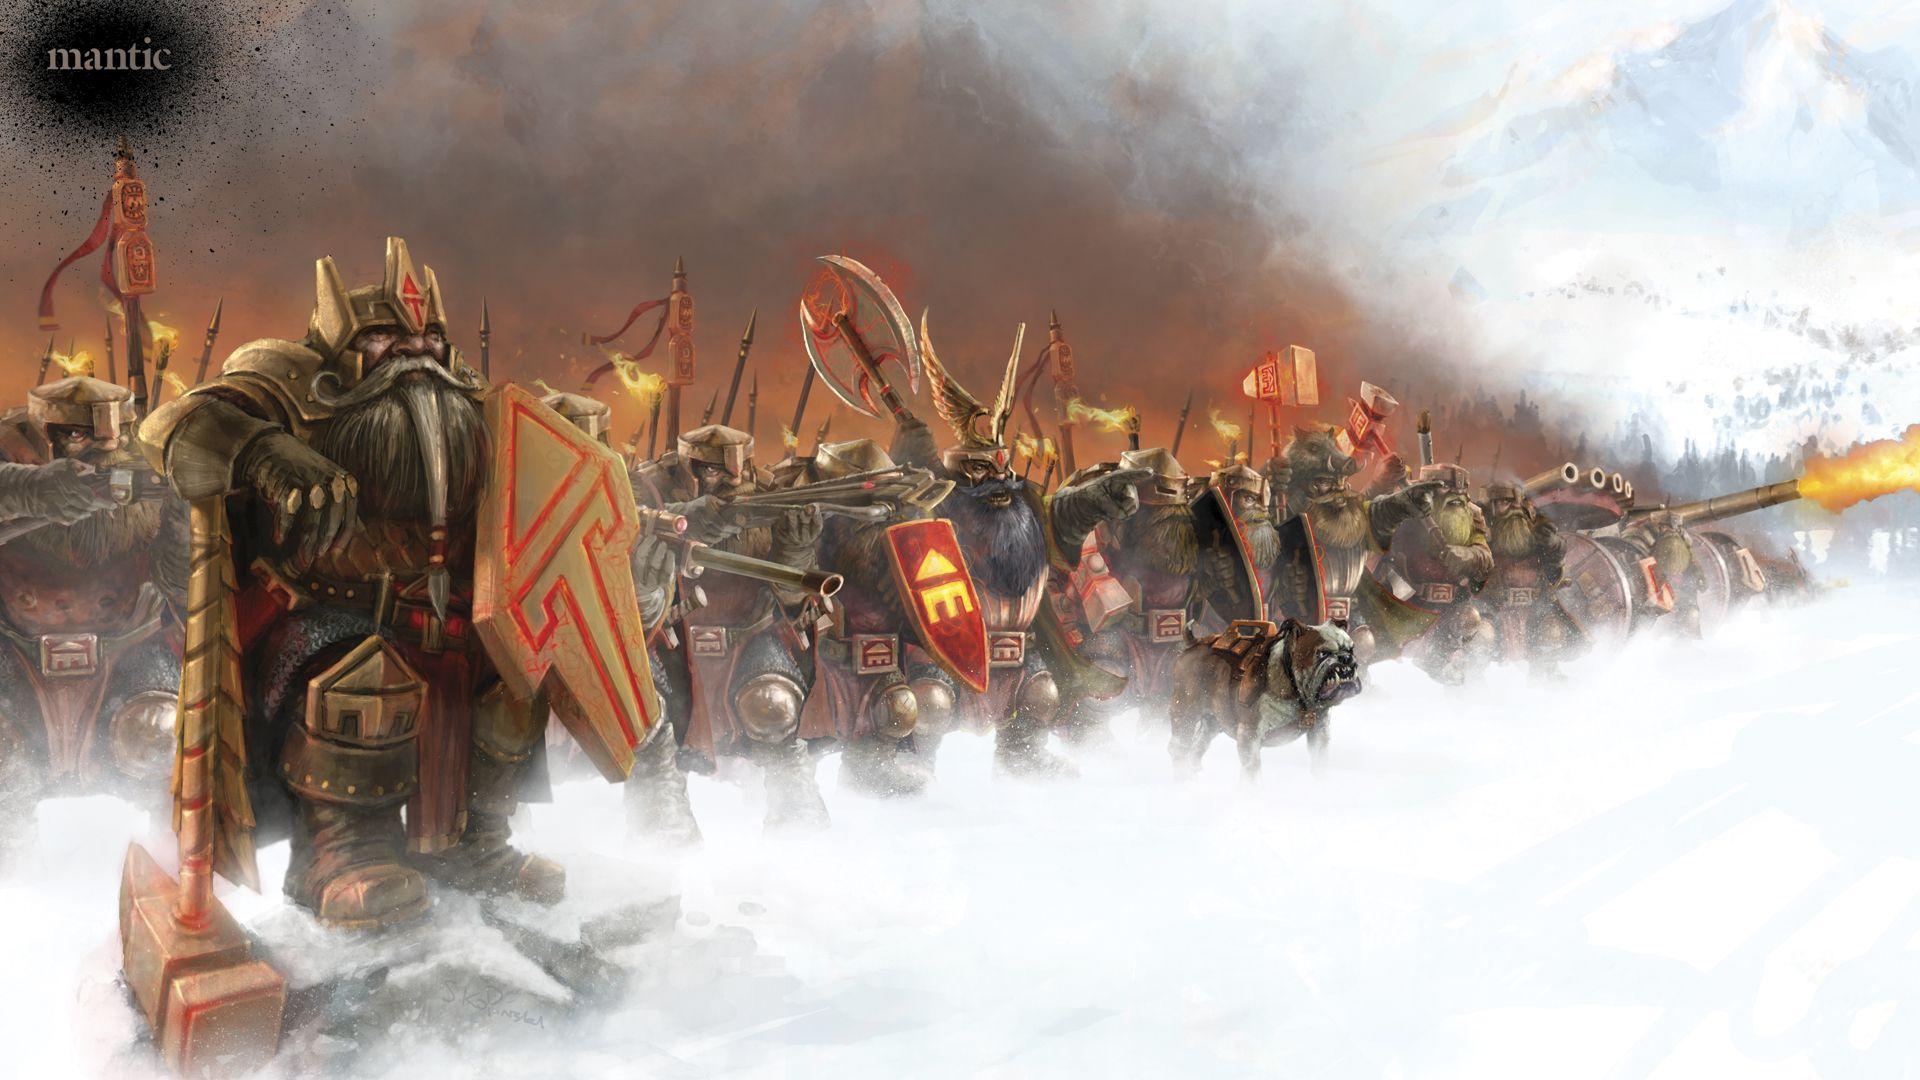 Http Www Marketwallpapers Com Wallpapers 12 Wallpaper 73074 Jpg Fantasy Dwarf Fantasy Warrior Art